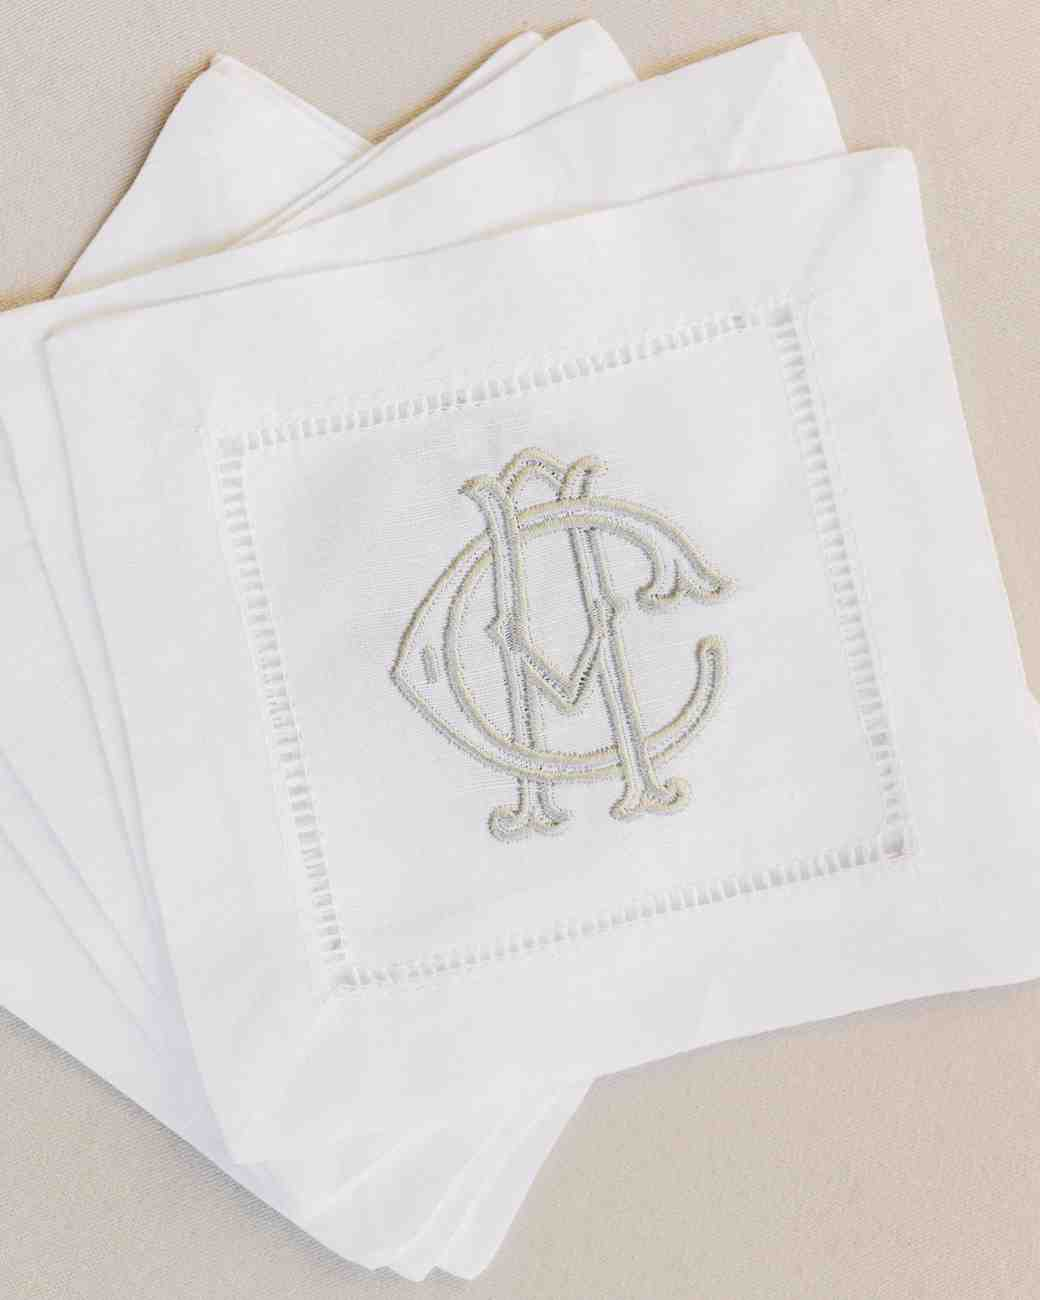 anneclaire-chris-wedding-france-napkins-100-s113034-00716.jpg